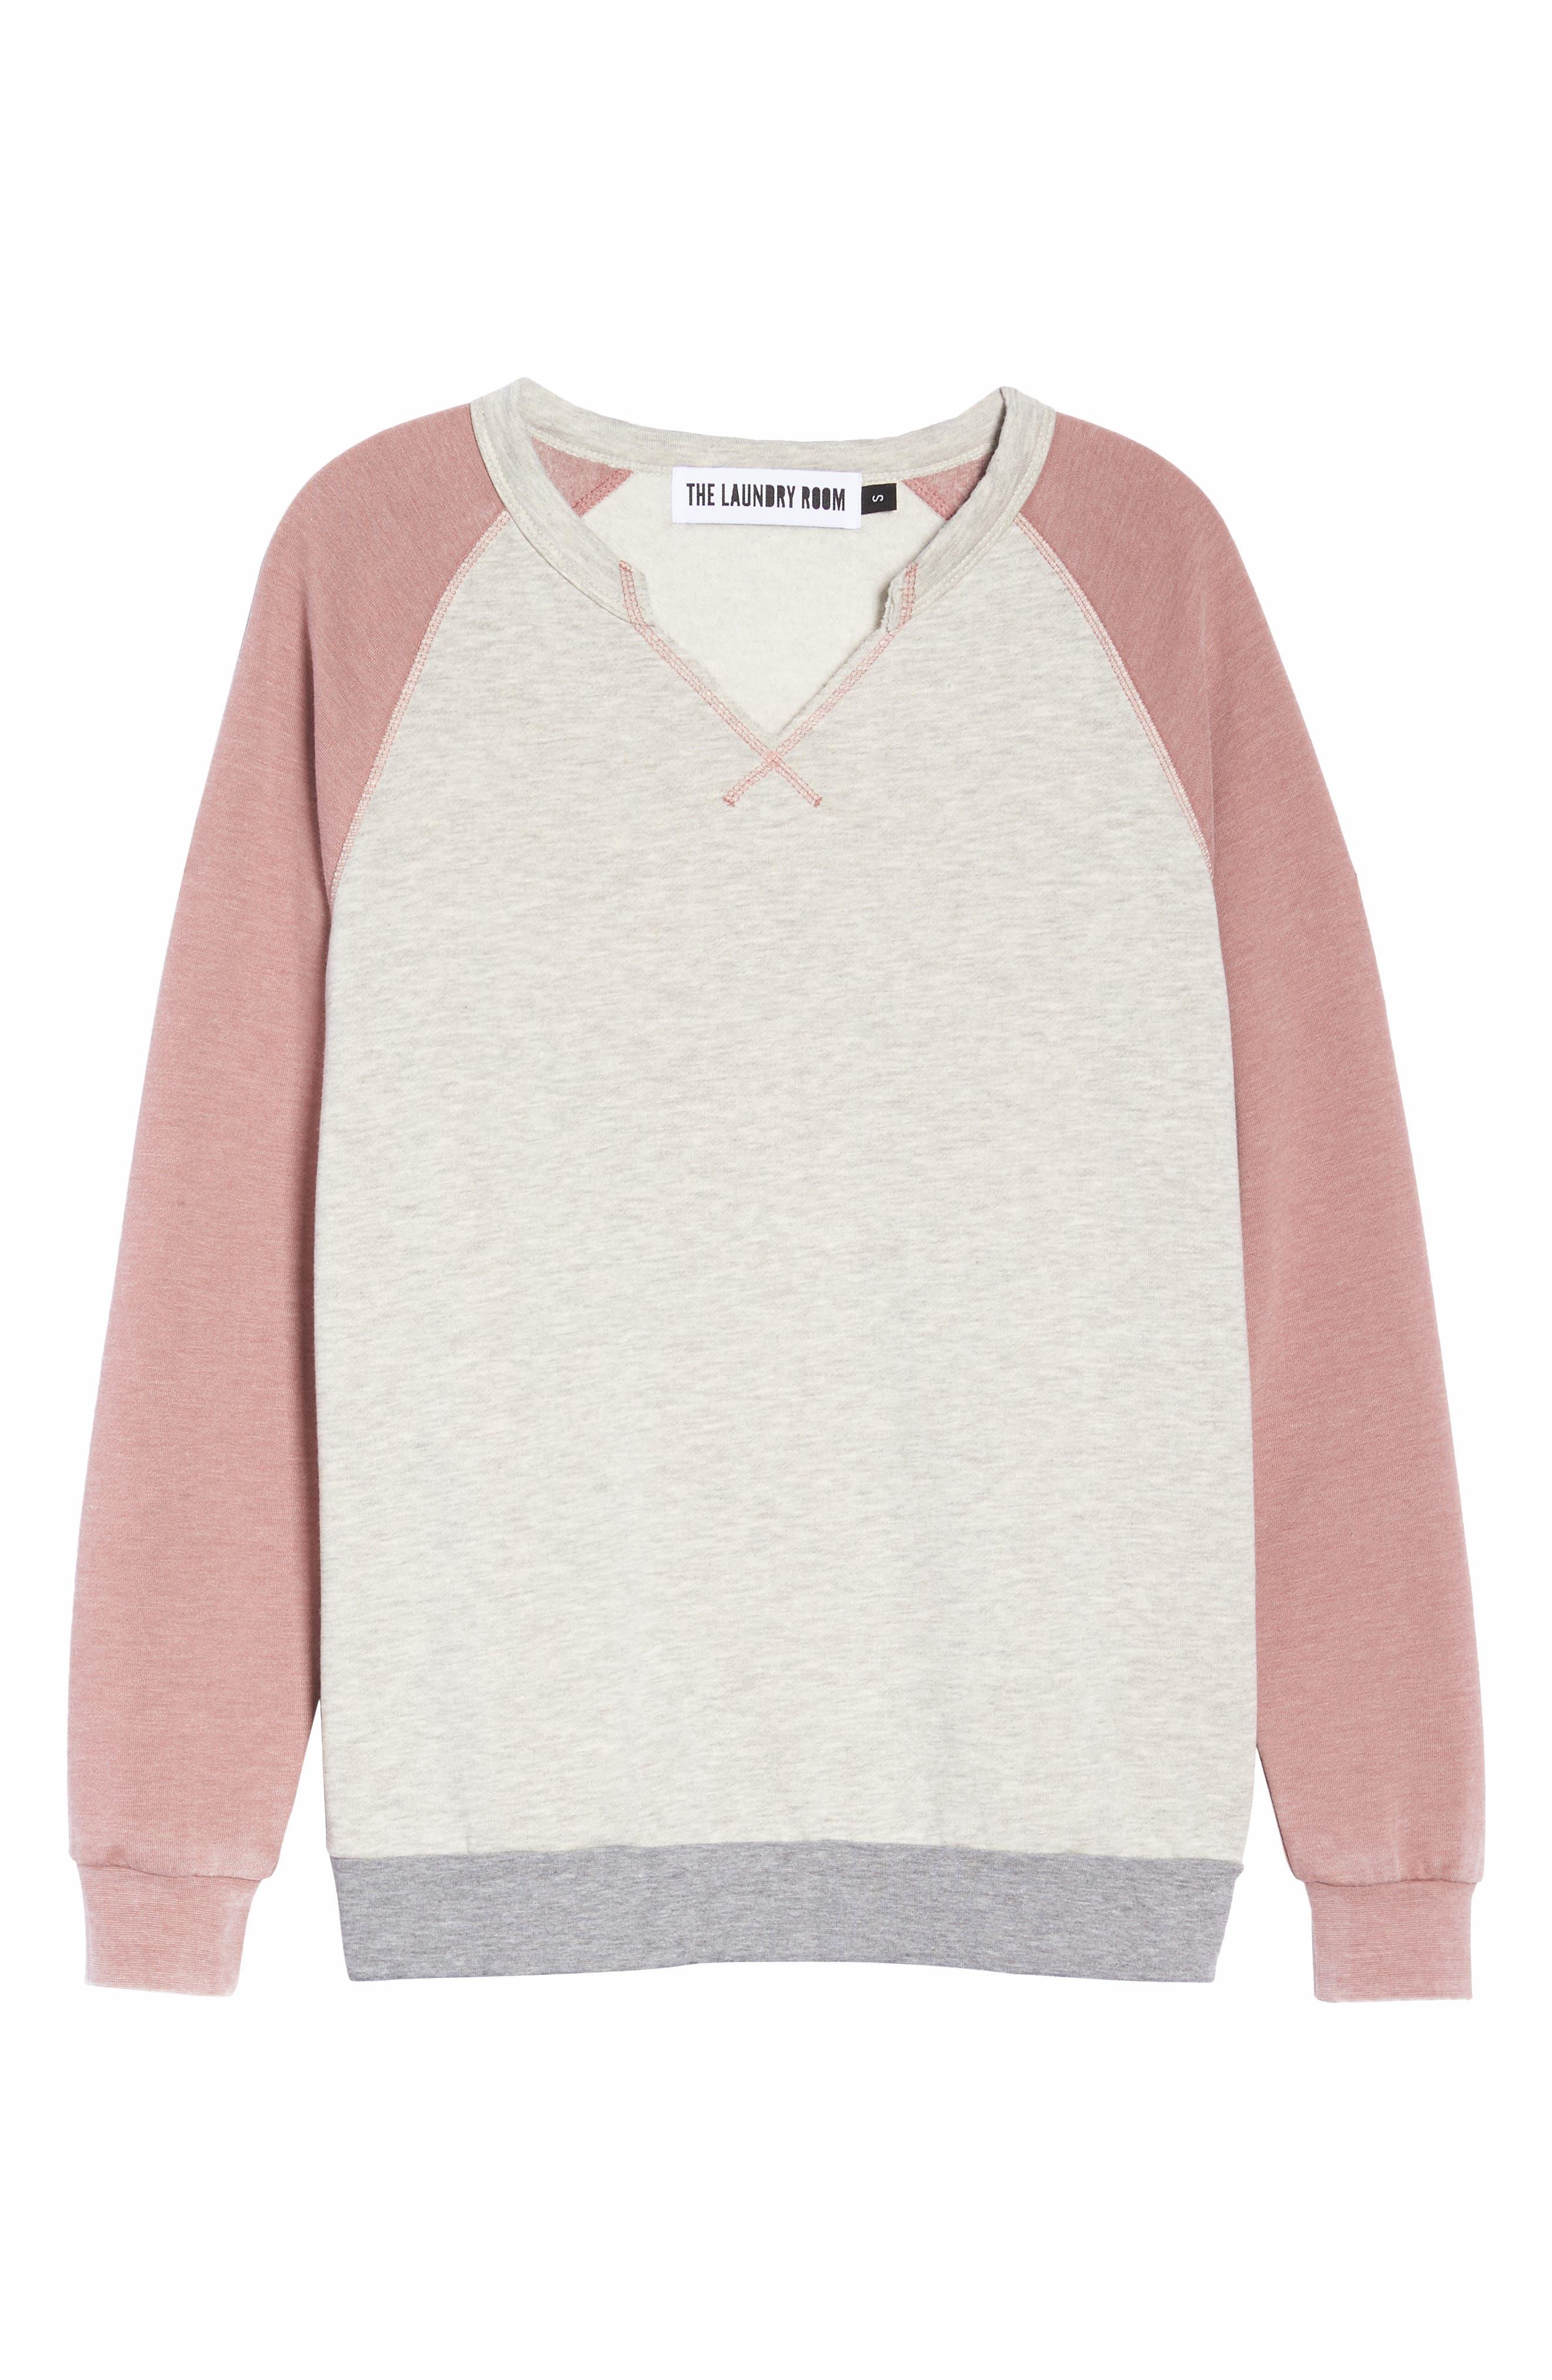 Sweatshirt,                             Alternate thumbnail 6, color,                             PEBBLE HEATHER / MAUVE